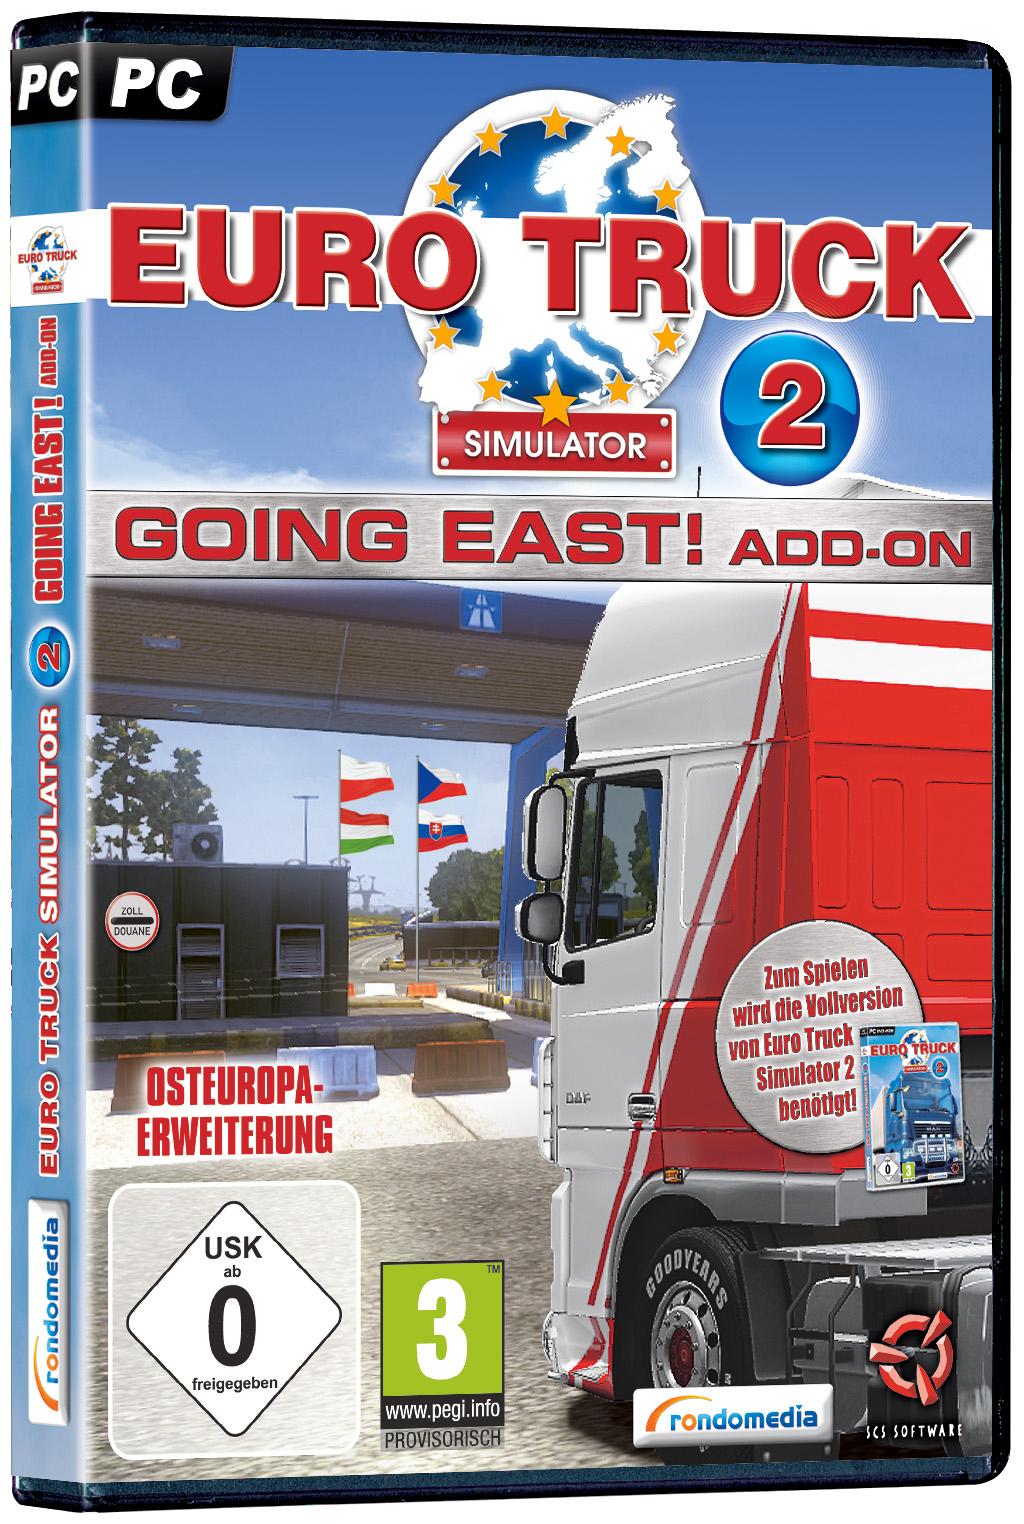 euro truck simulator 2 test tipps videos news release. Black Bedroom Furniture Sets. Home Design Ideas